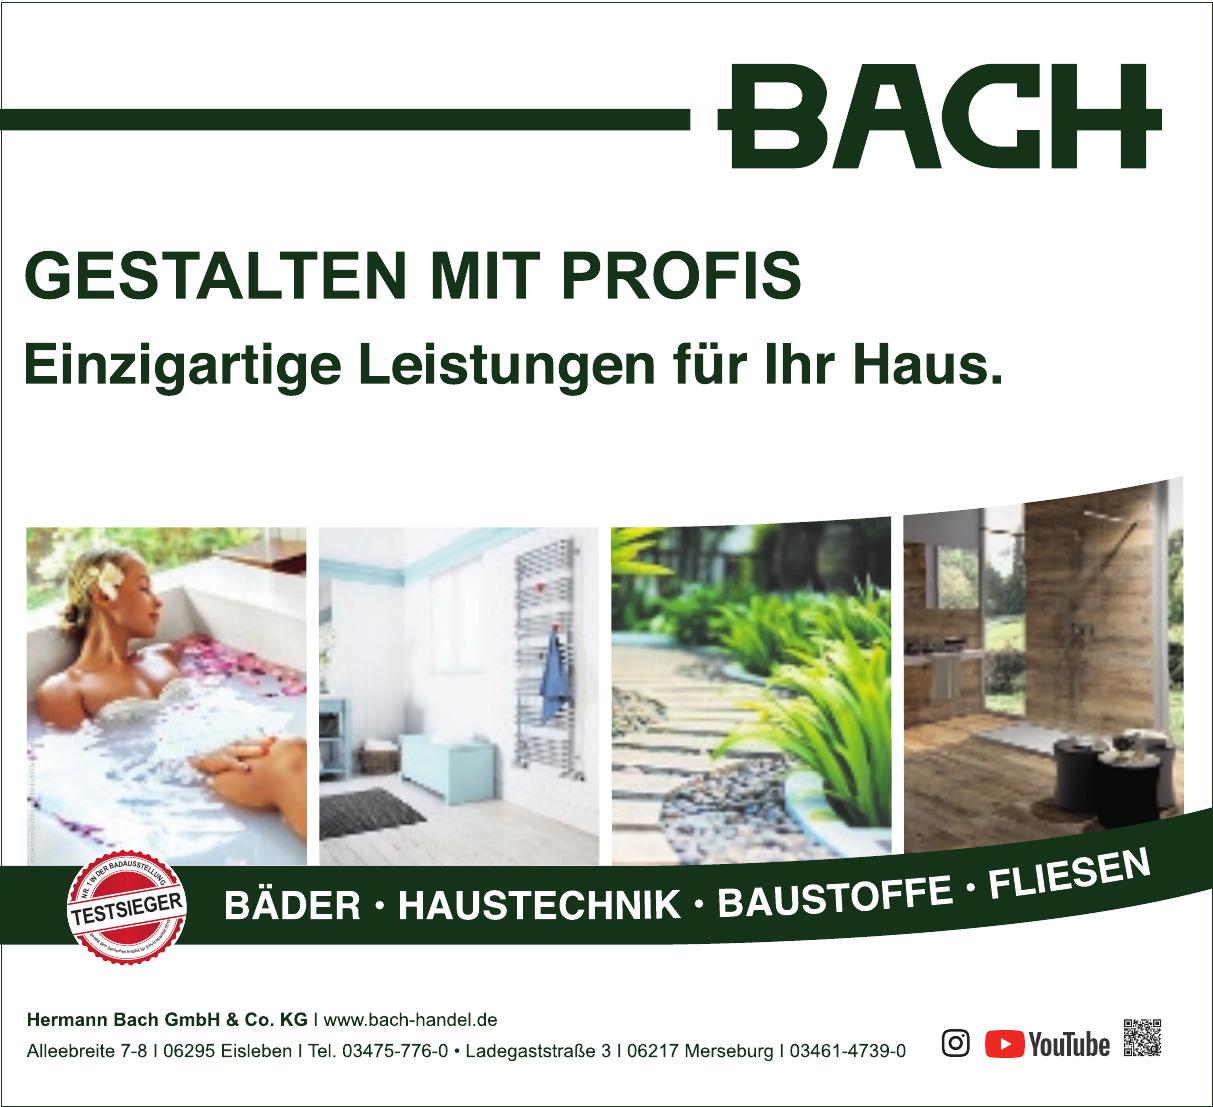 Hermann Bach GmbH & Co. KG